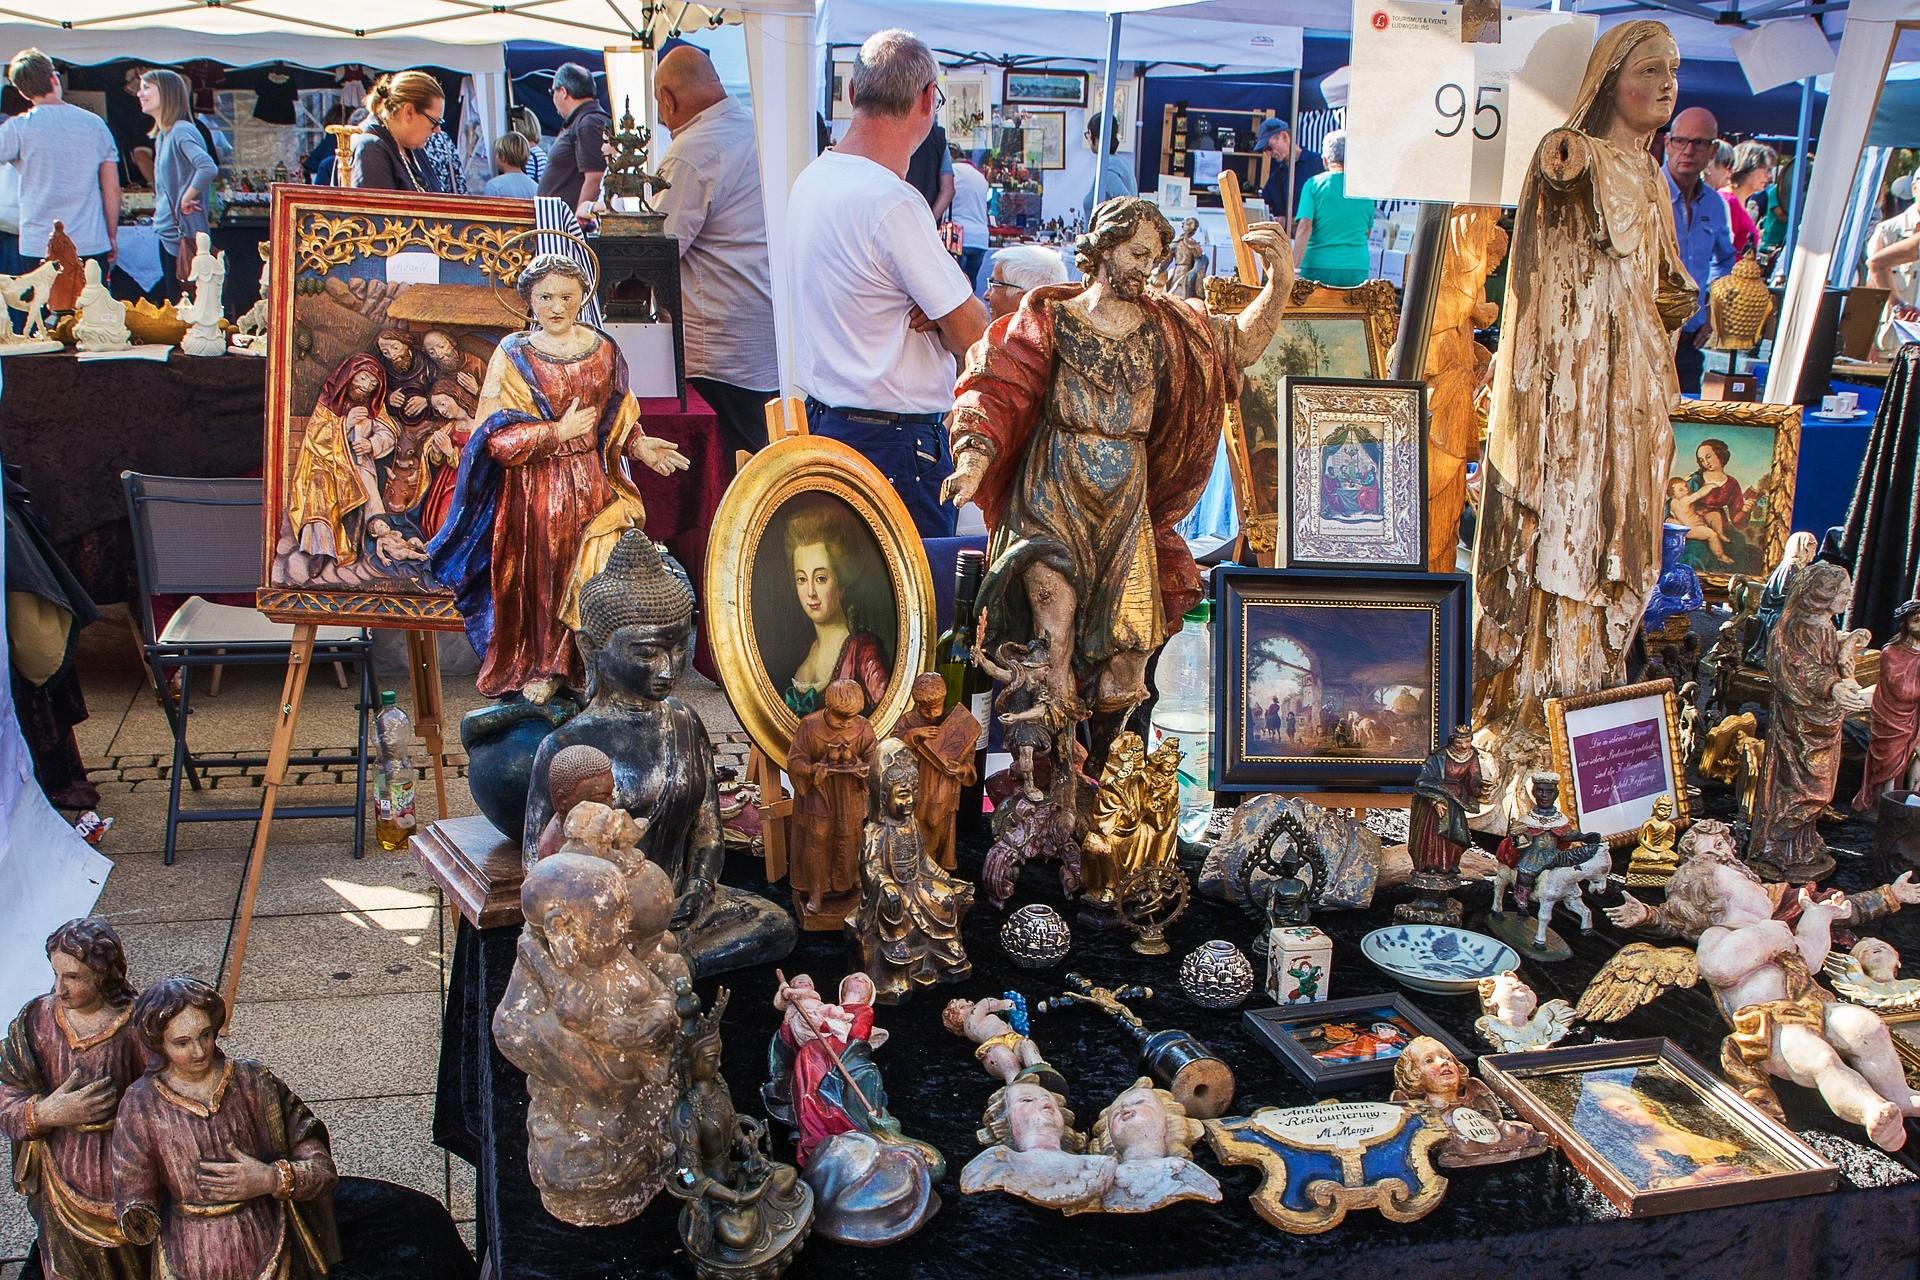 Antique market in Venice